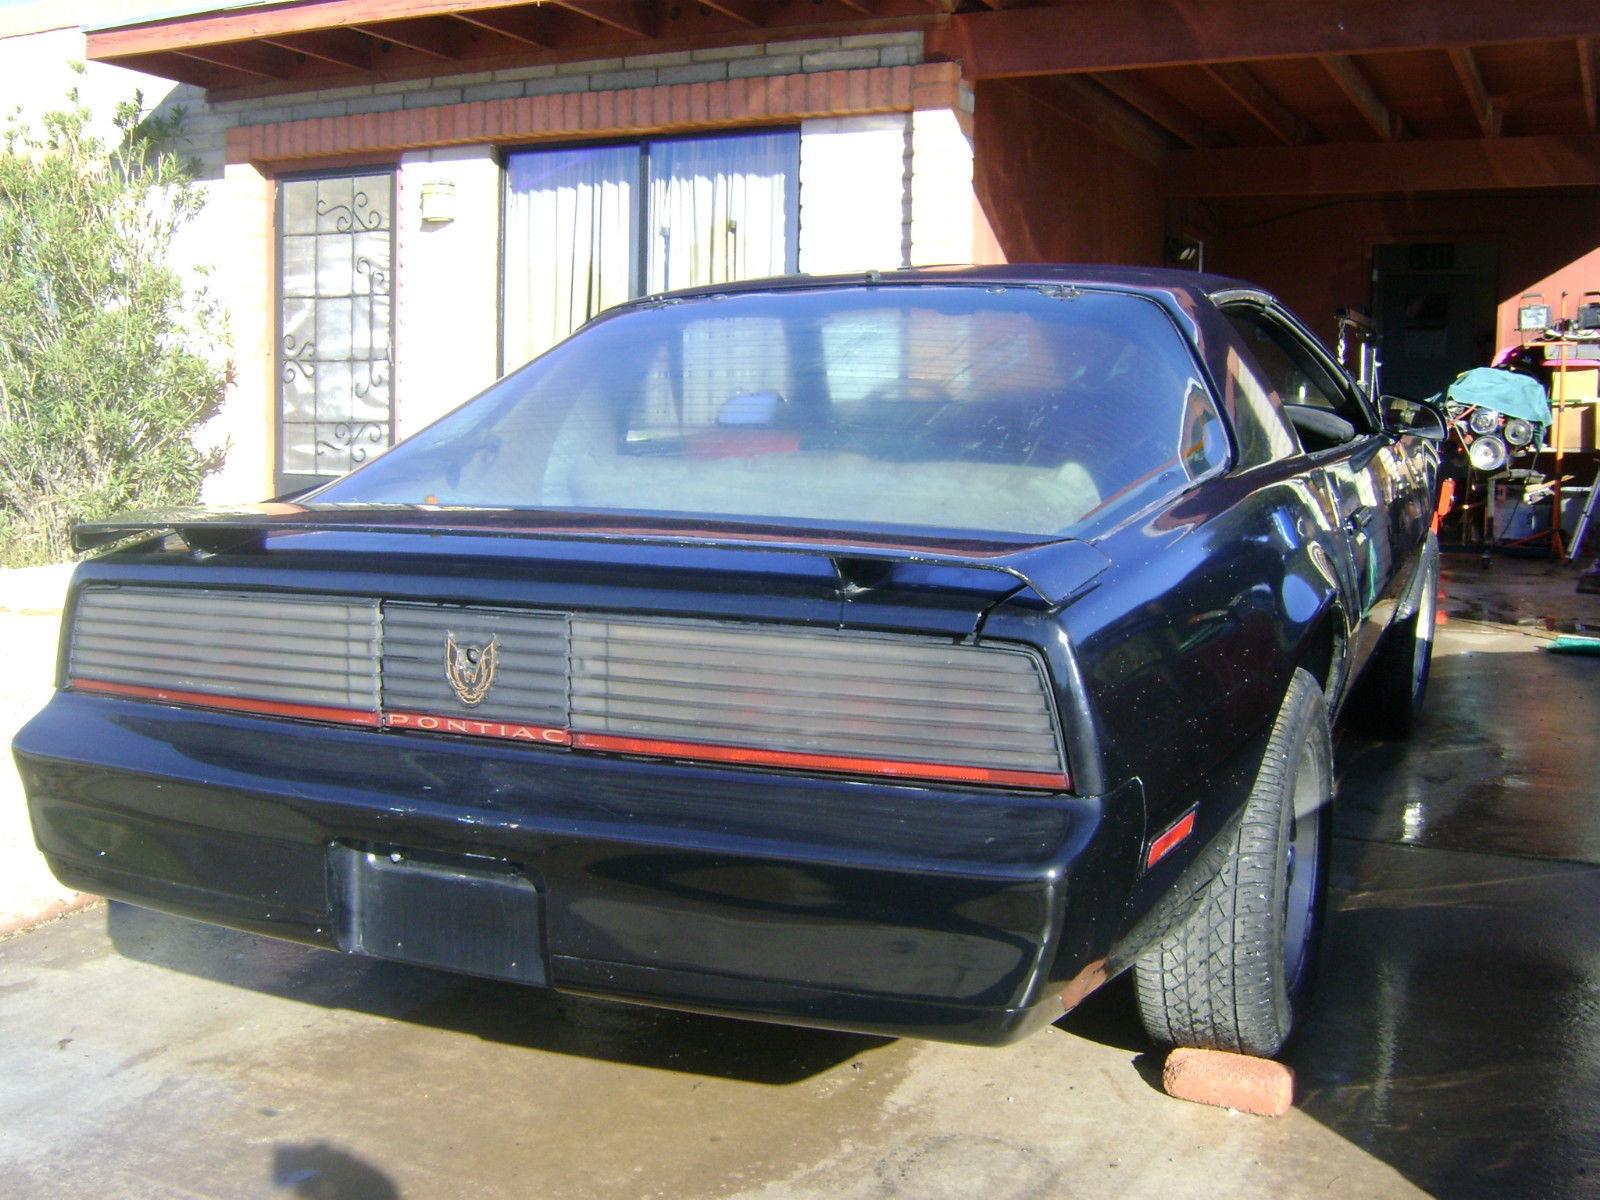 Knight Rider Car For Sale >> 1982 Pontiac Firebird Trans am Knight Rider Car - Classic Pontiac Trans Am 1982 for sale